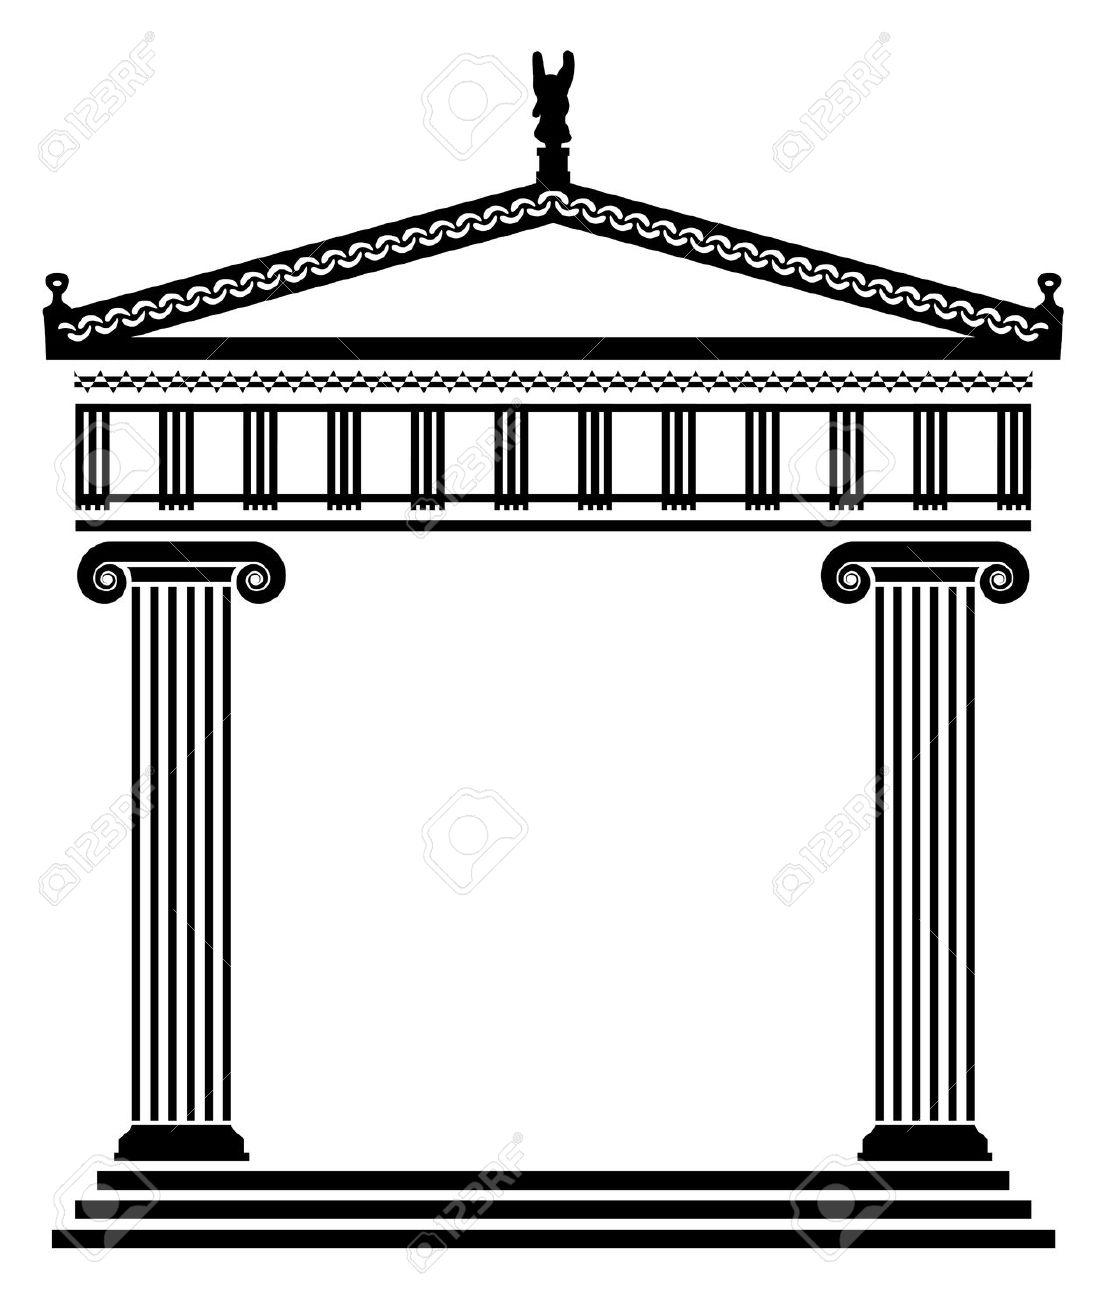 Greek architecture clipart.